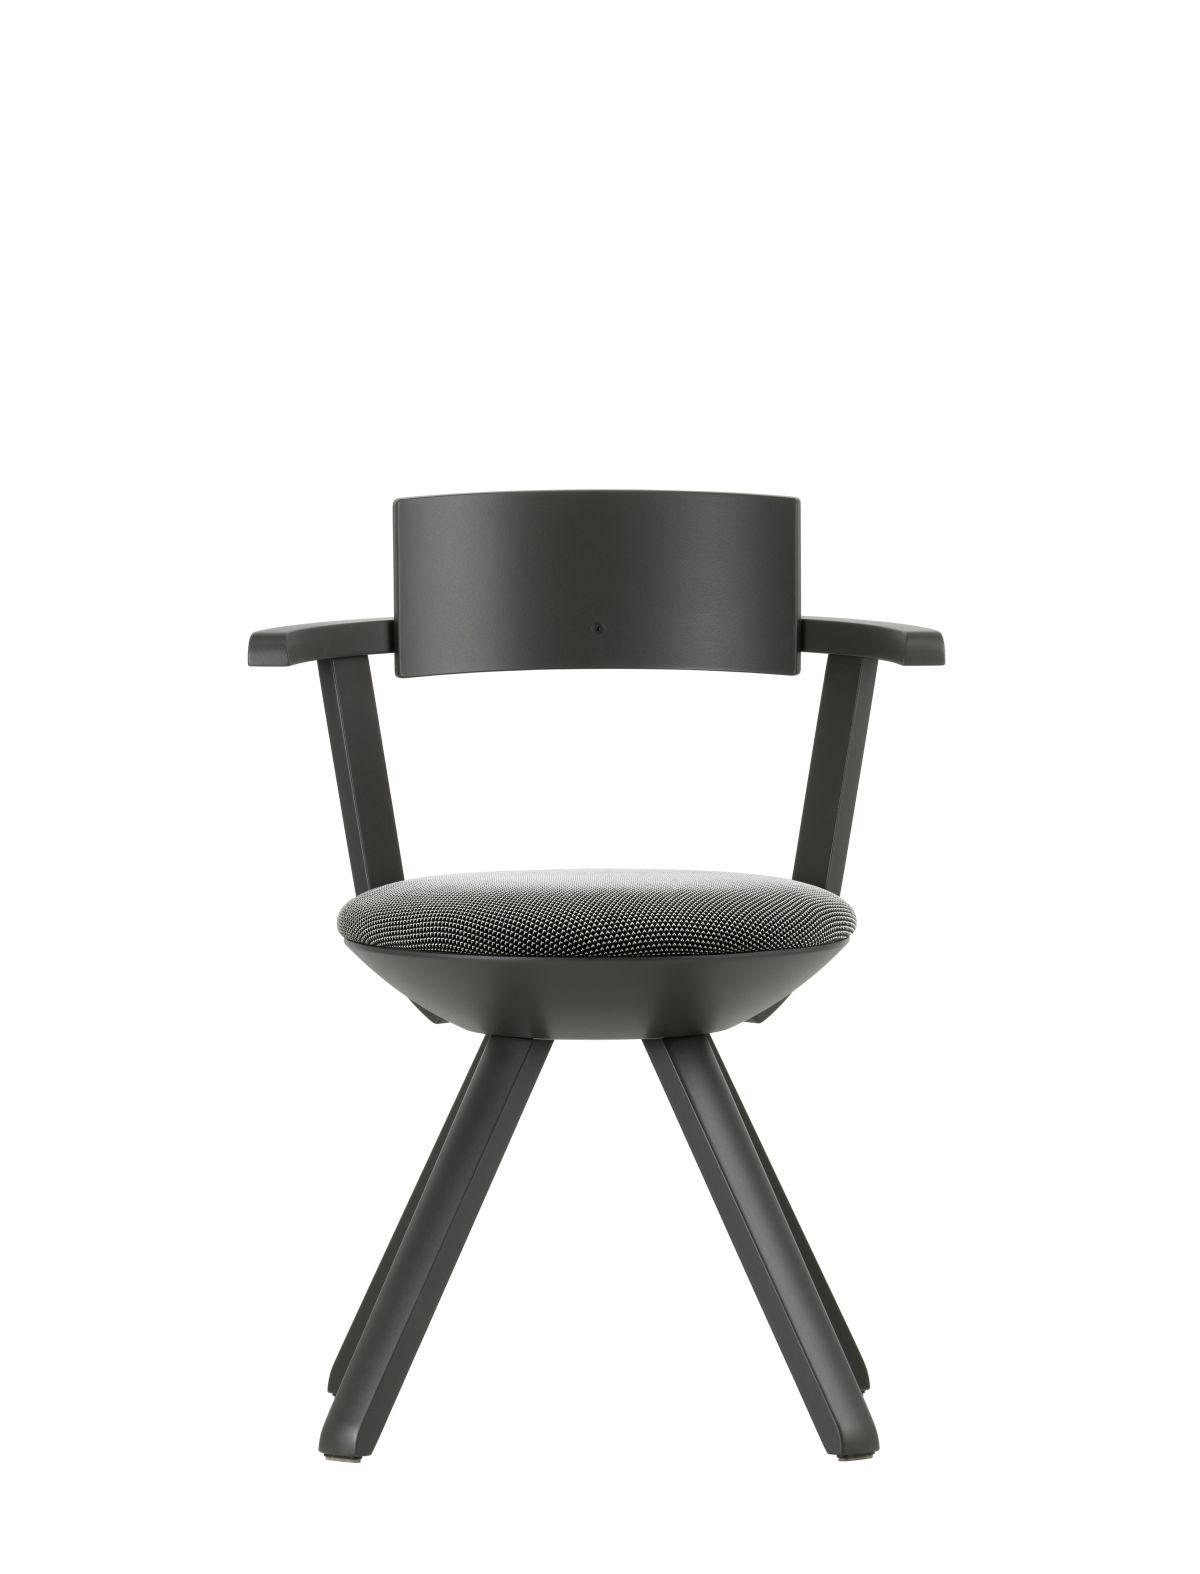 Rival Chair KG002 asphalt lacquer black / white 3d knit upholstery